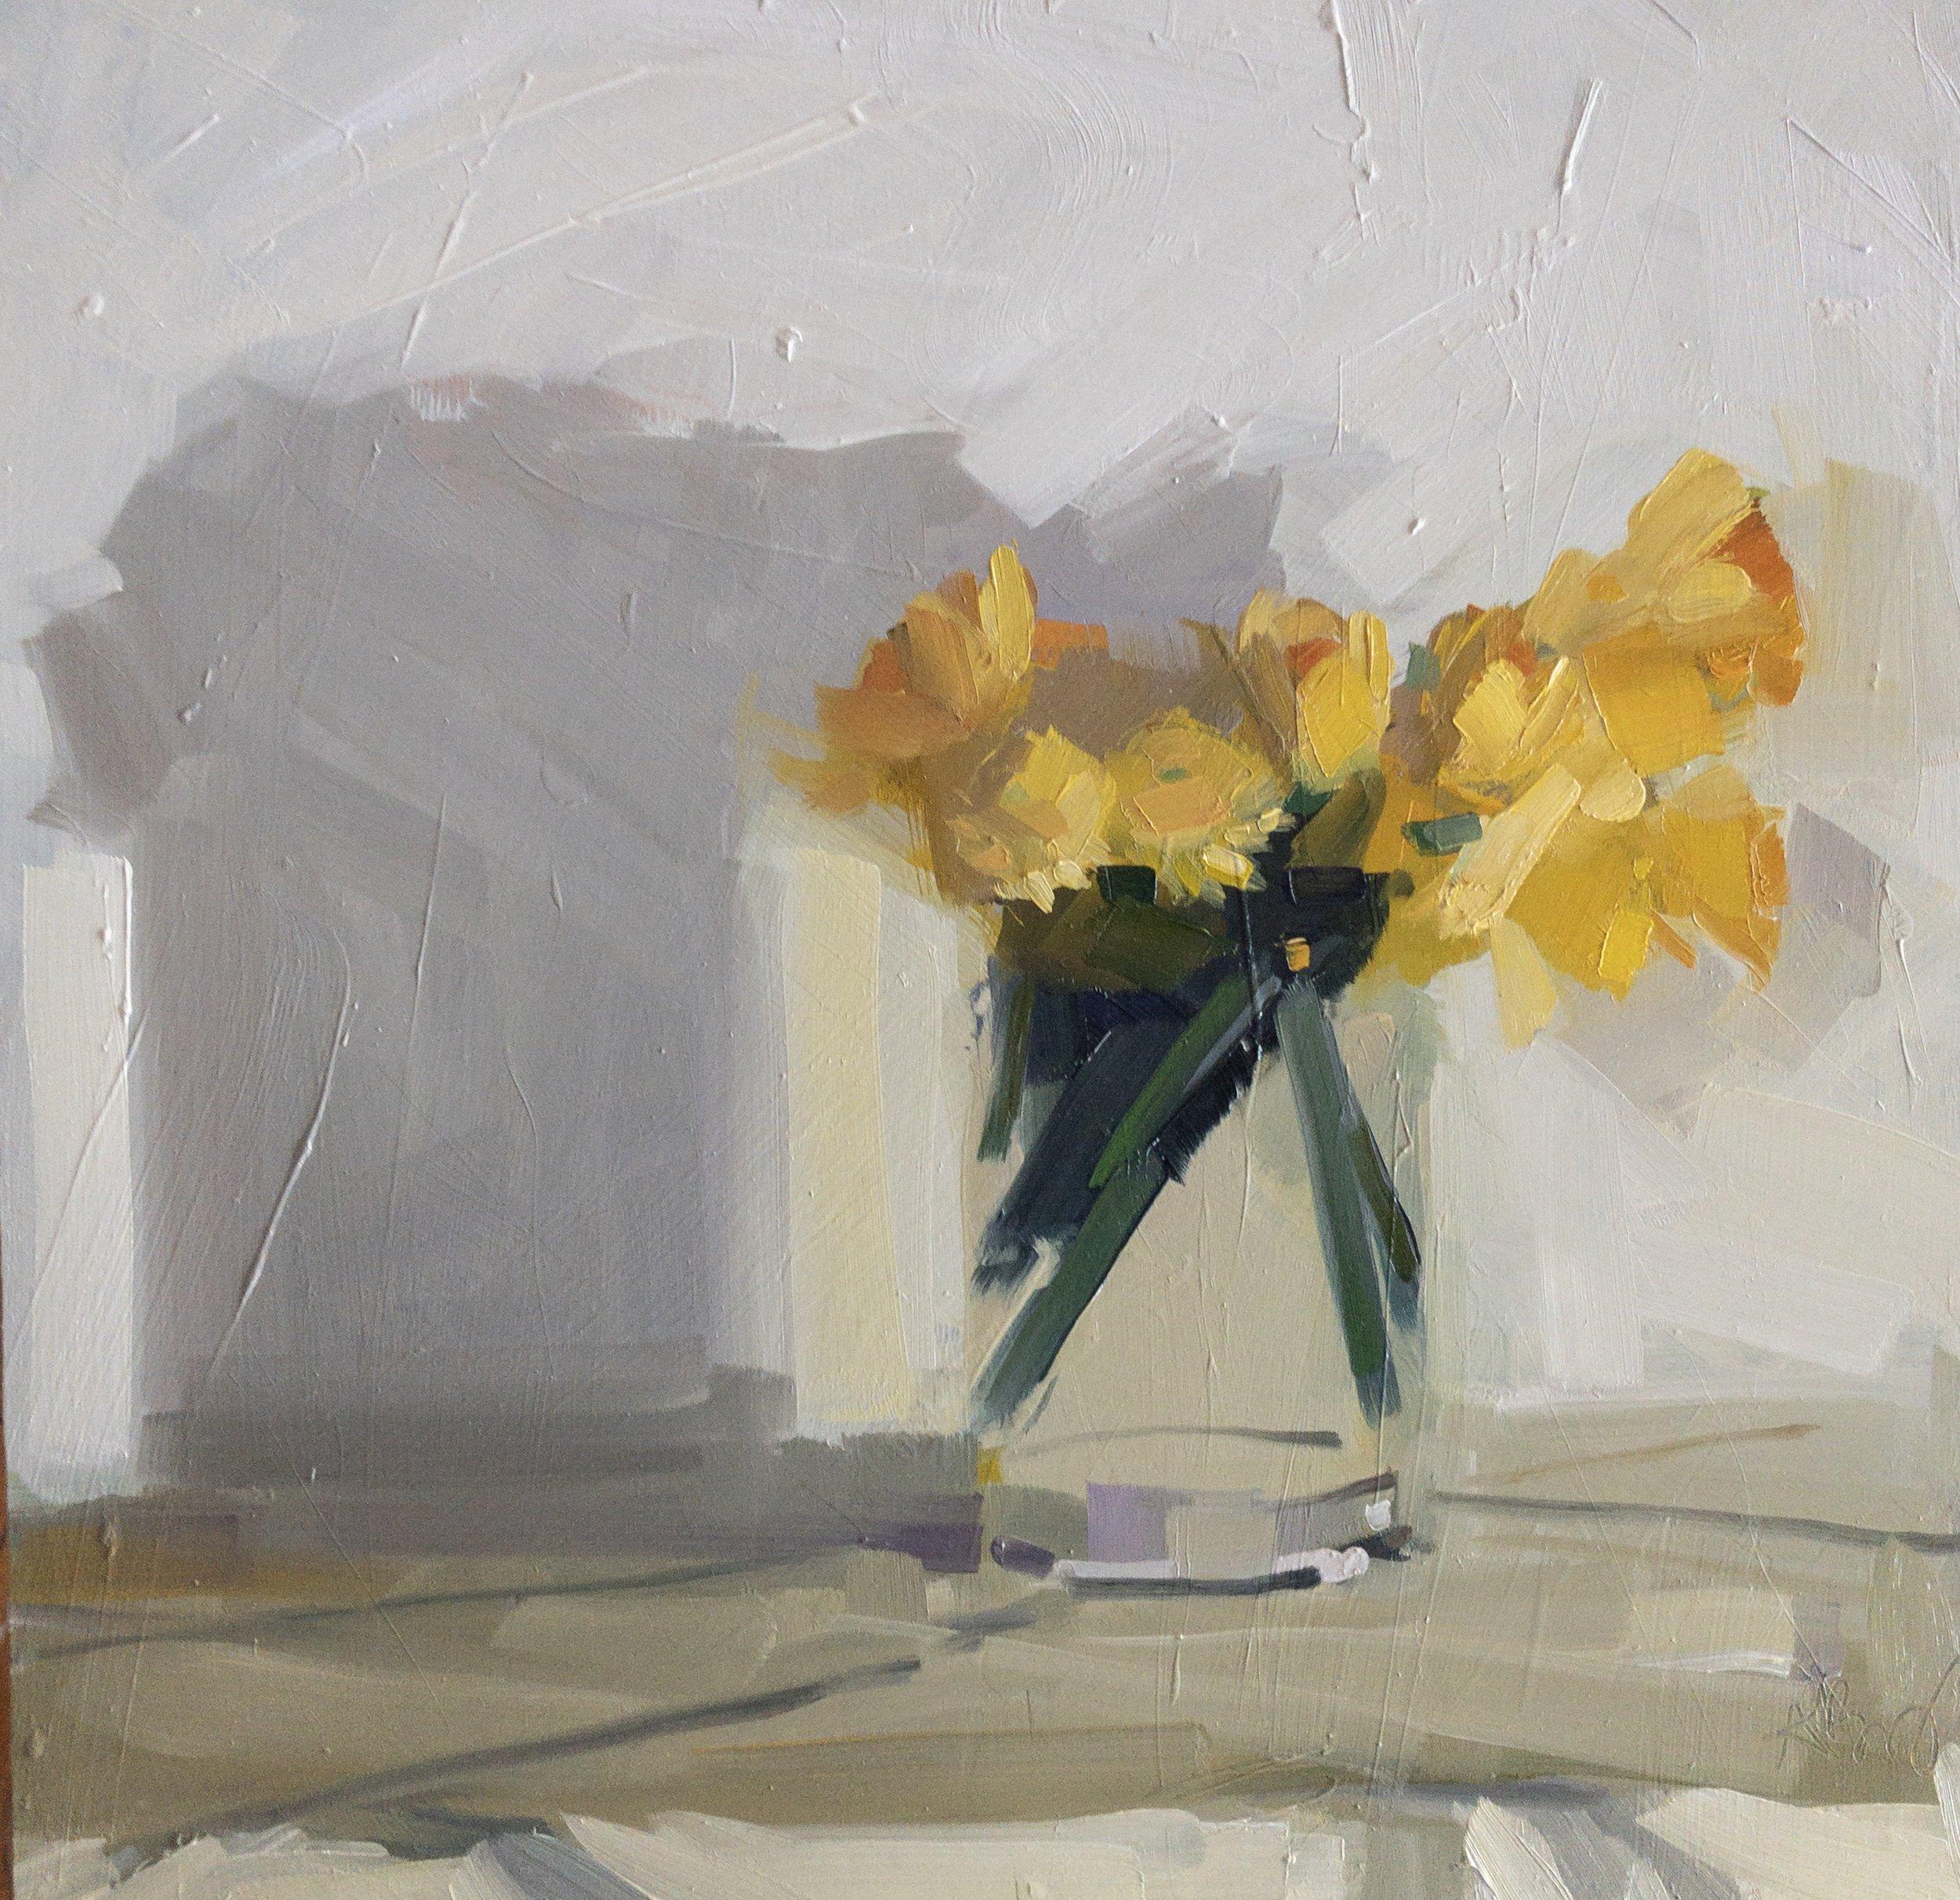 Daffodils 2, 14 x 14, oil on panel.